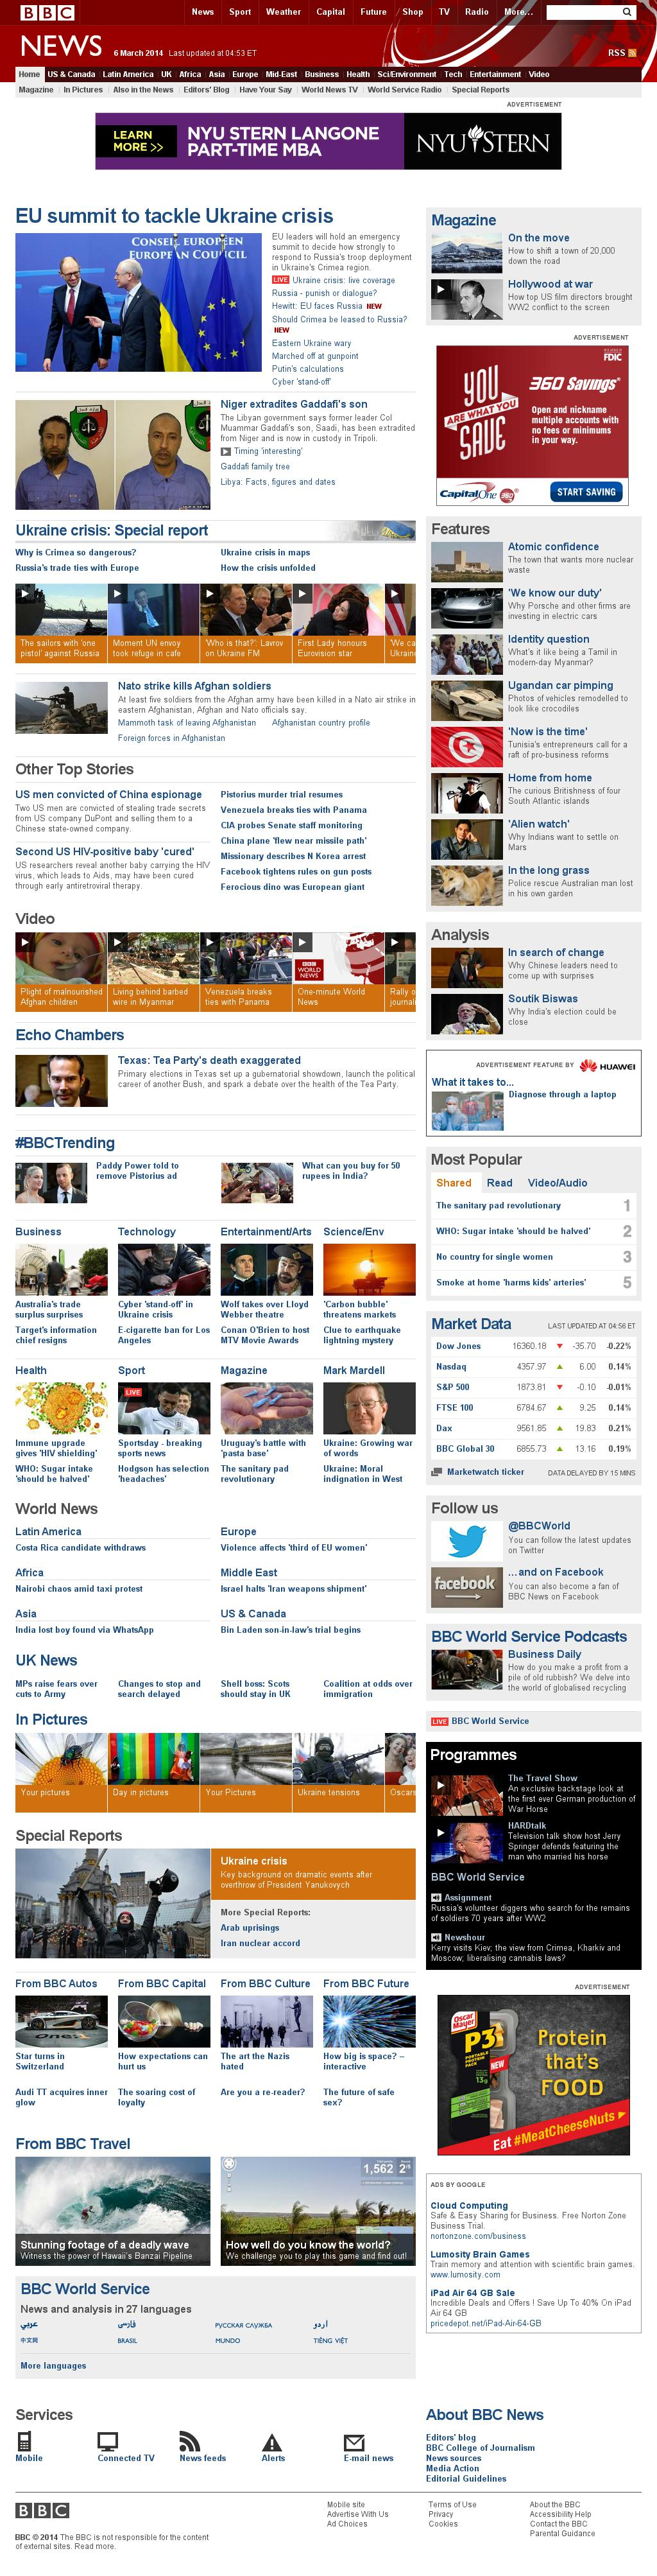 BBC at Thursday March 6, 2014, 10:01 a.m. UTC